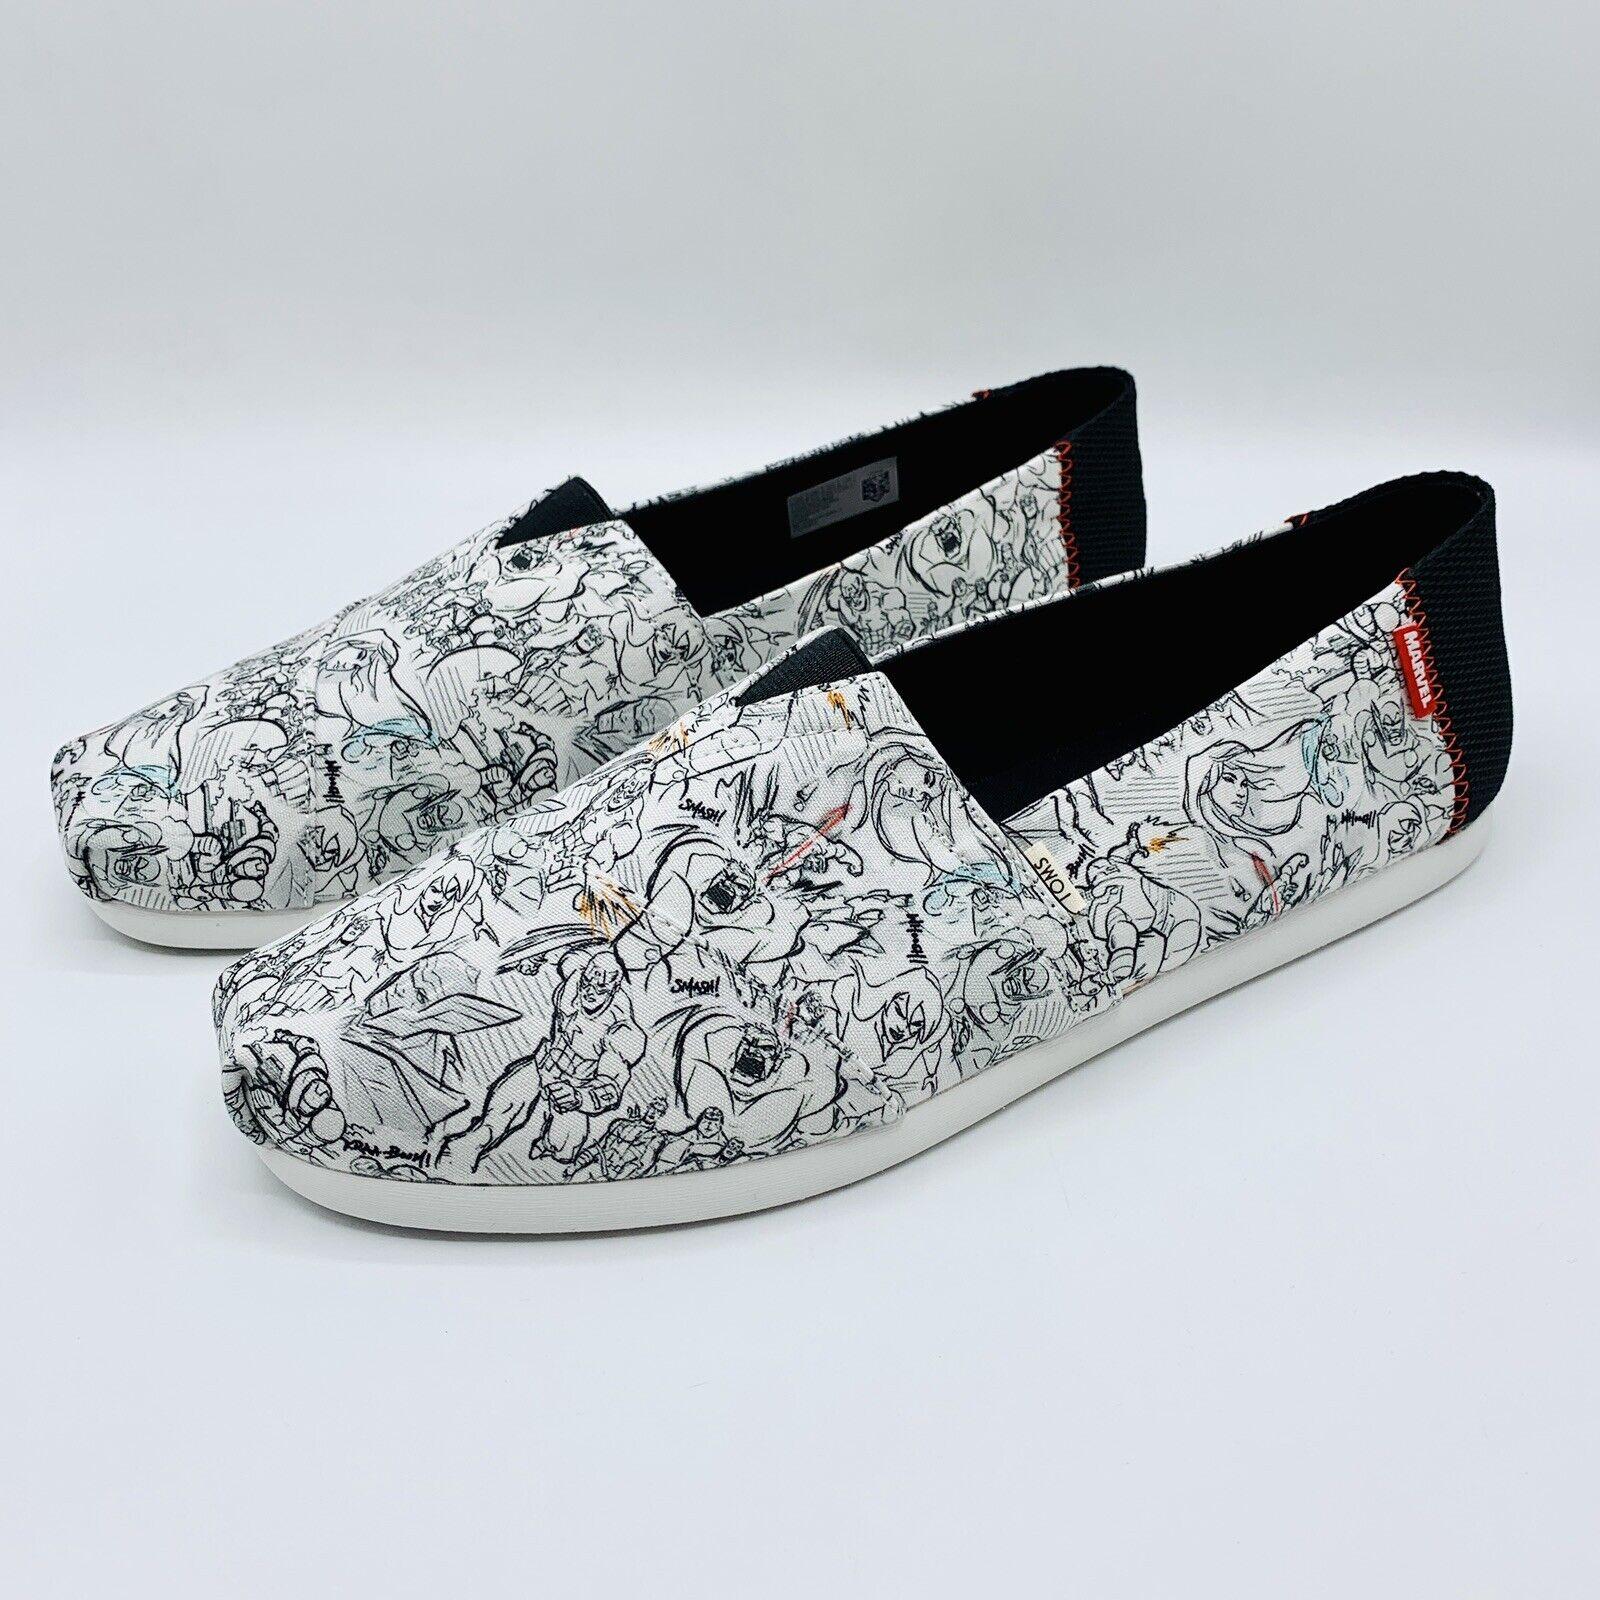 NEW! Toms x Marvel Concept Art Print Slip-On Alpargata Shoe. Men's Size 10.5.